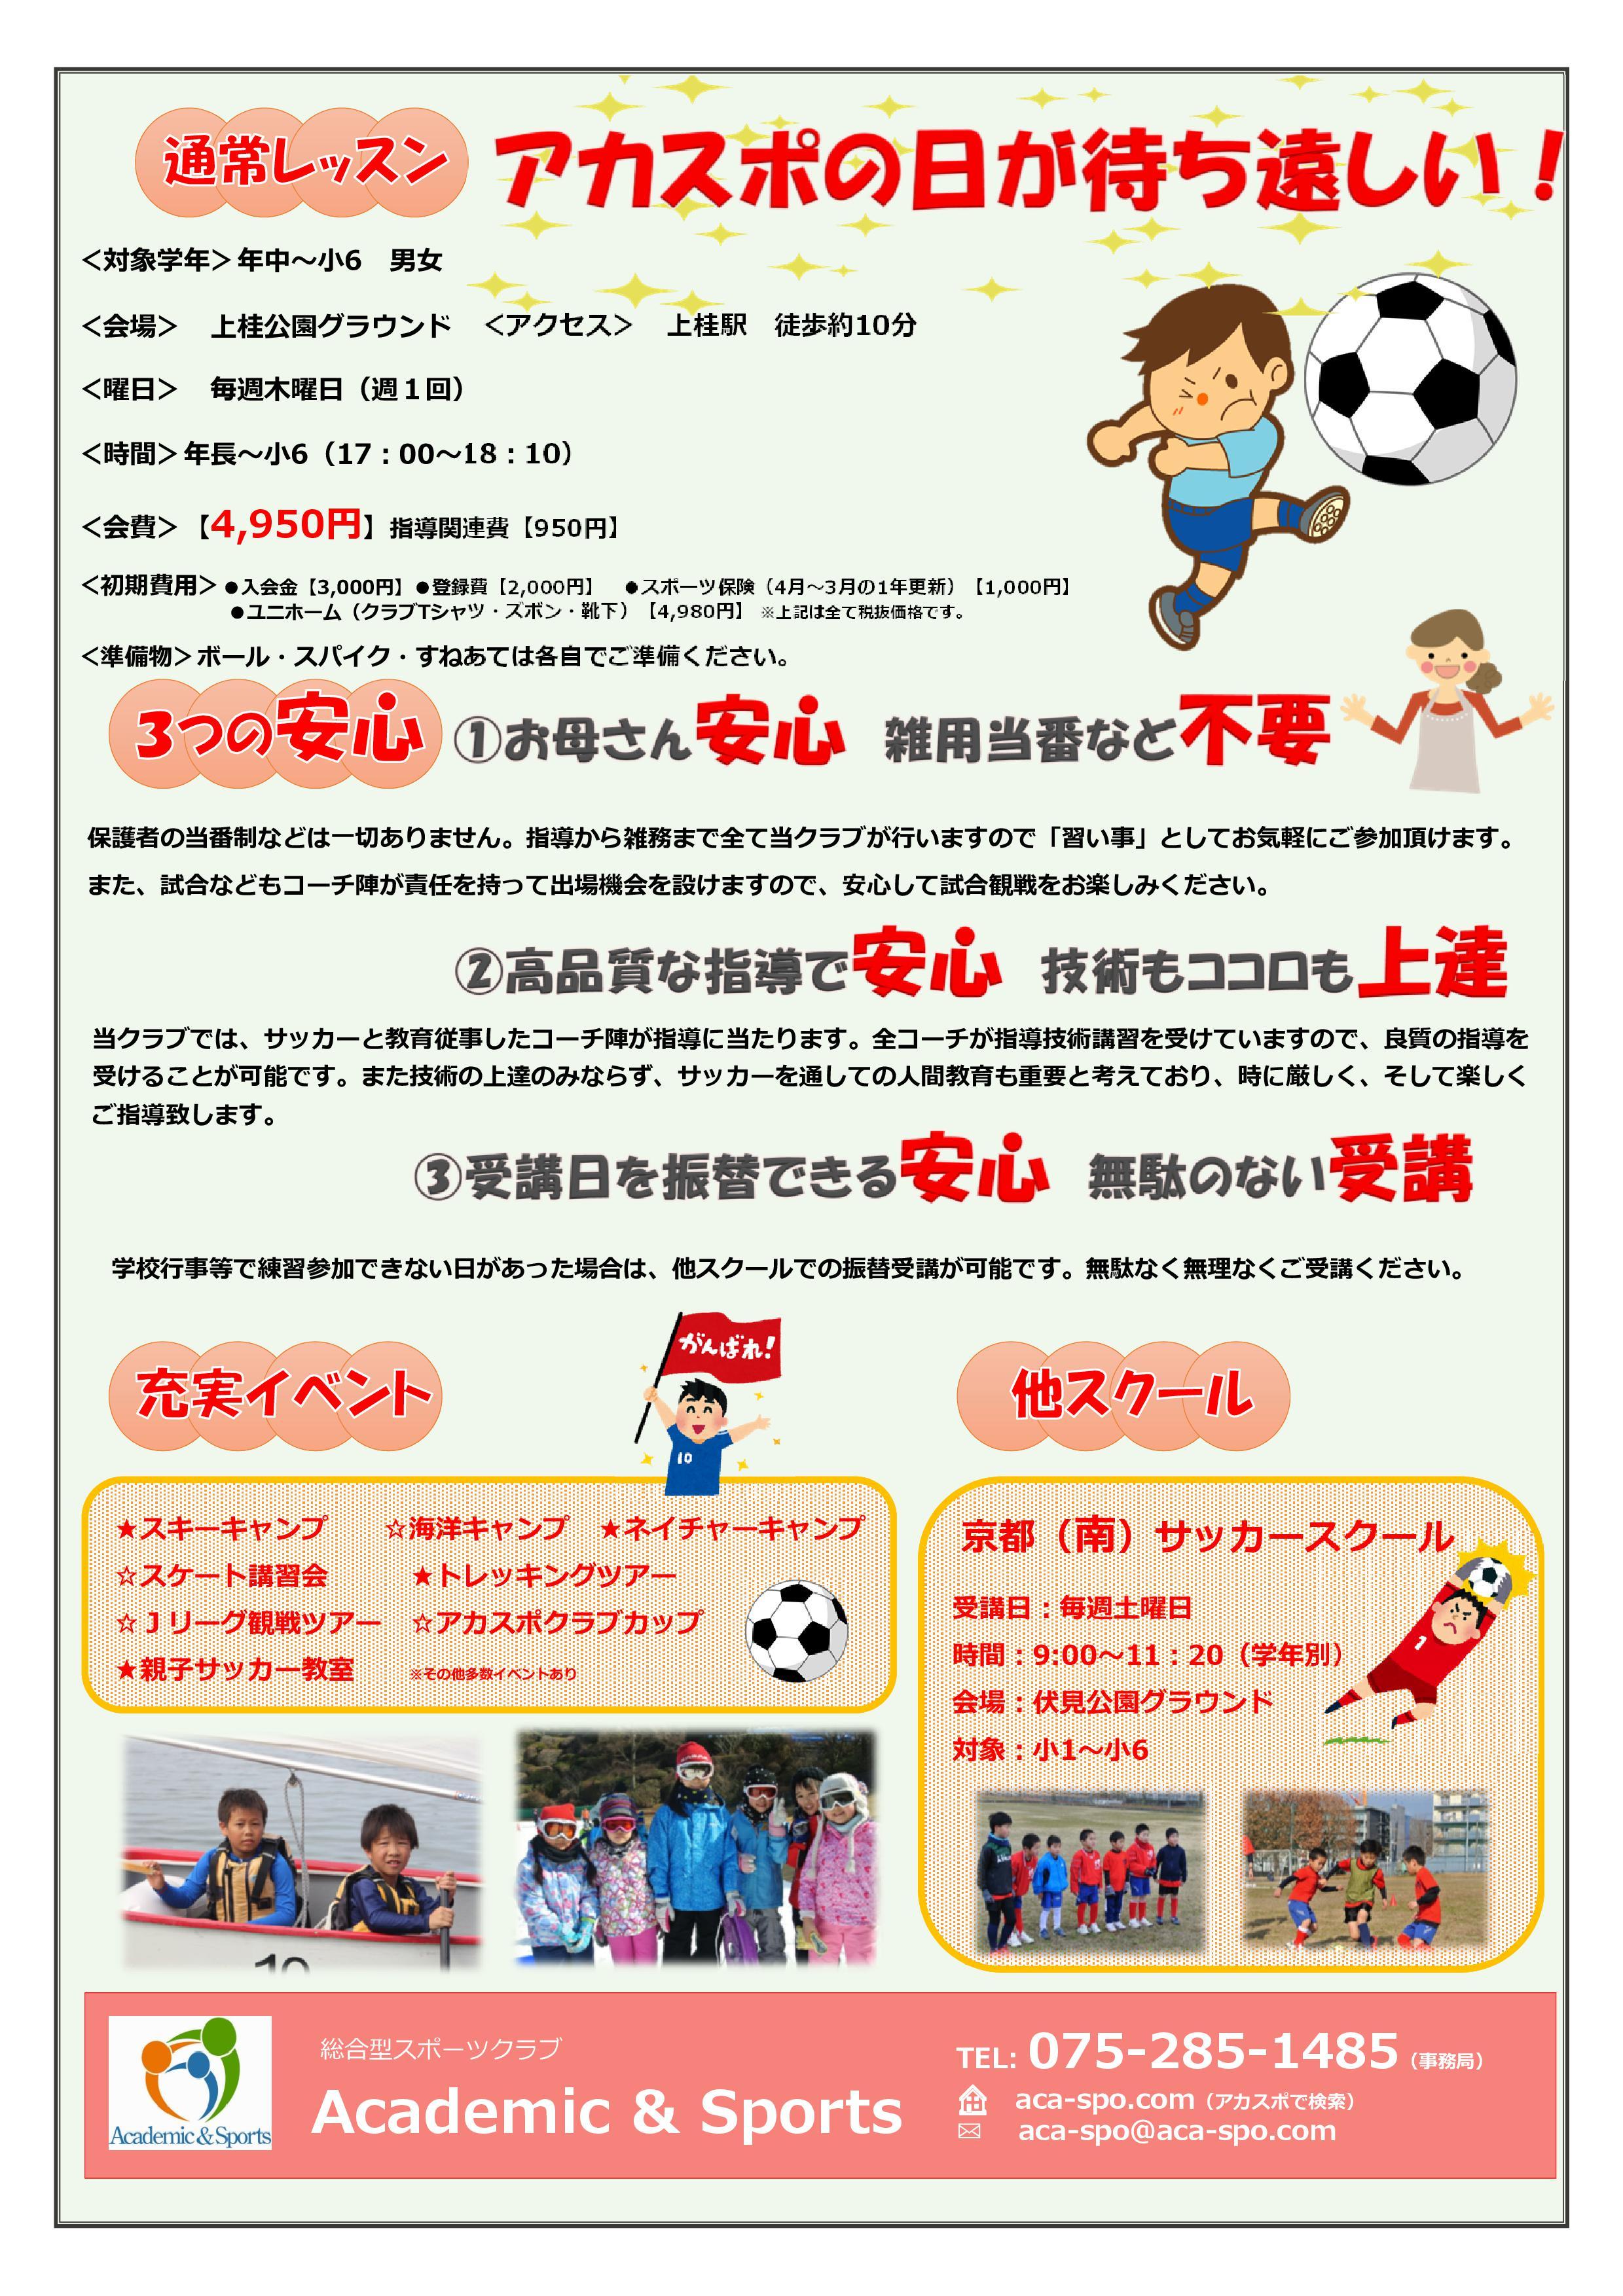 Microsoft PowerPoint - チラシ(上桂)-002